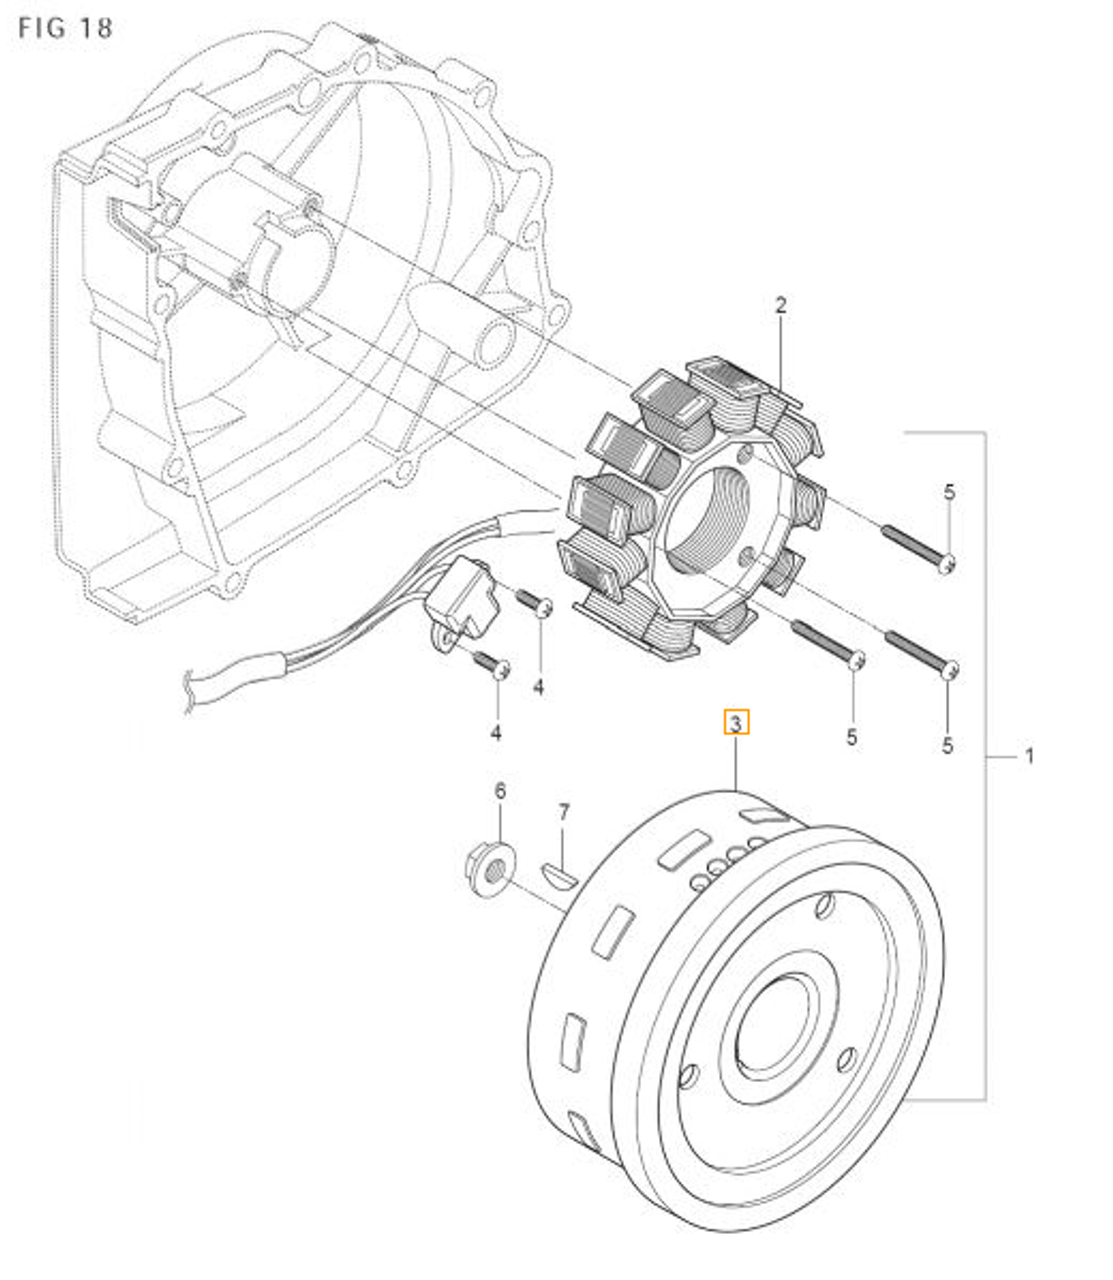 GV250 GT250R Flywheel Rotor Magneto2002 2003 2004 2005 2006 2007 2008 2009